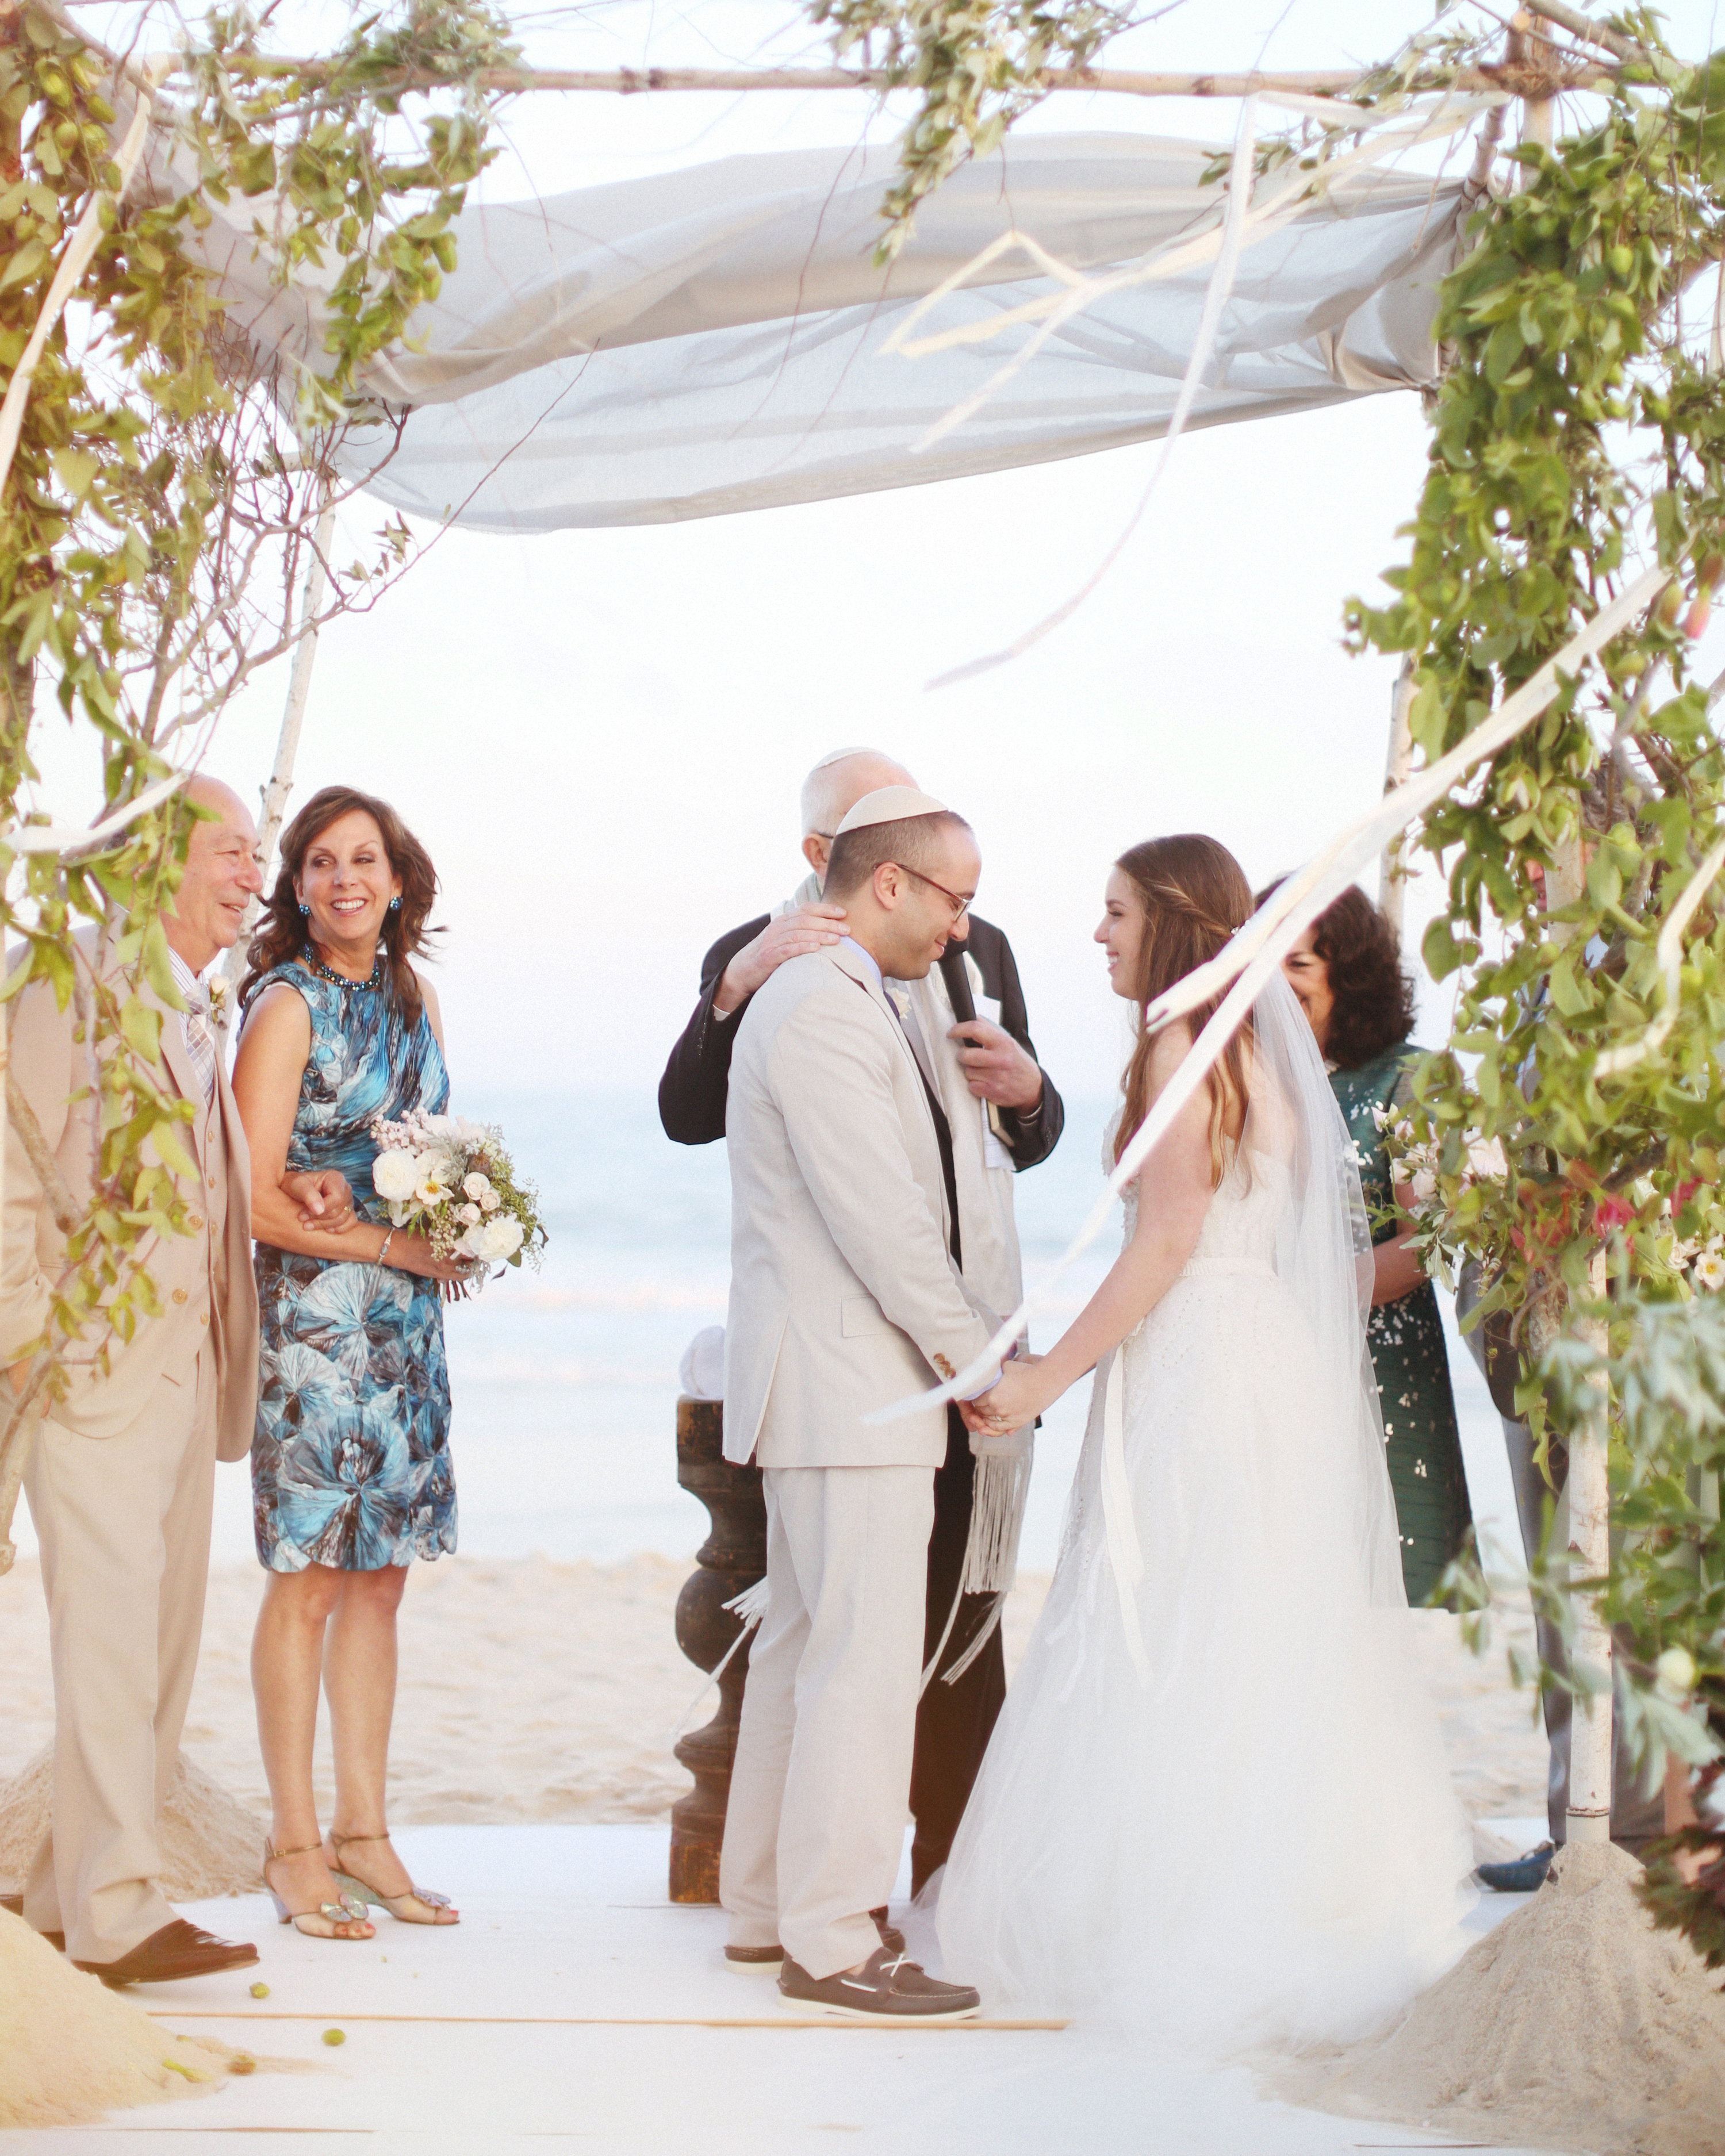 sarah-evan-wedding-ceremony2-0514.jpg